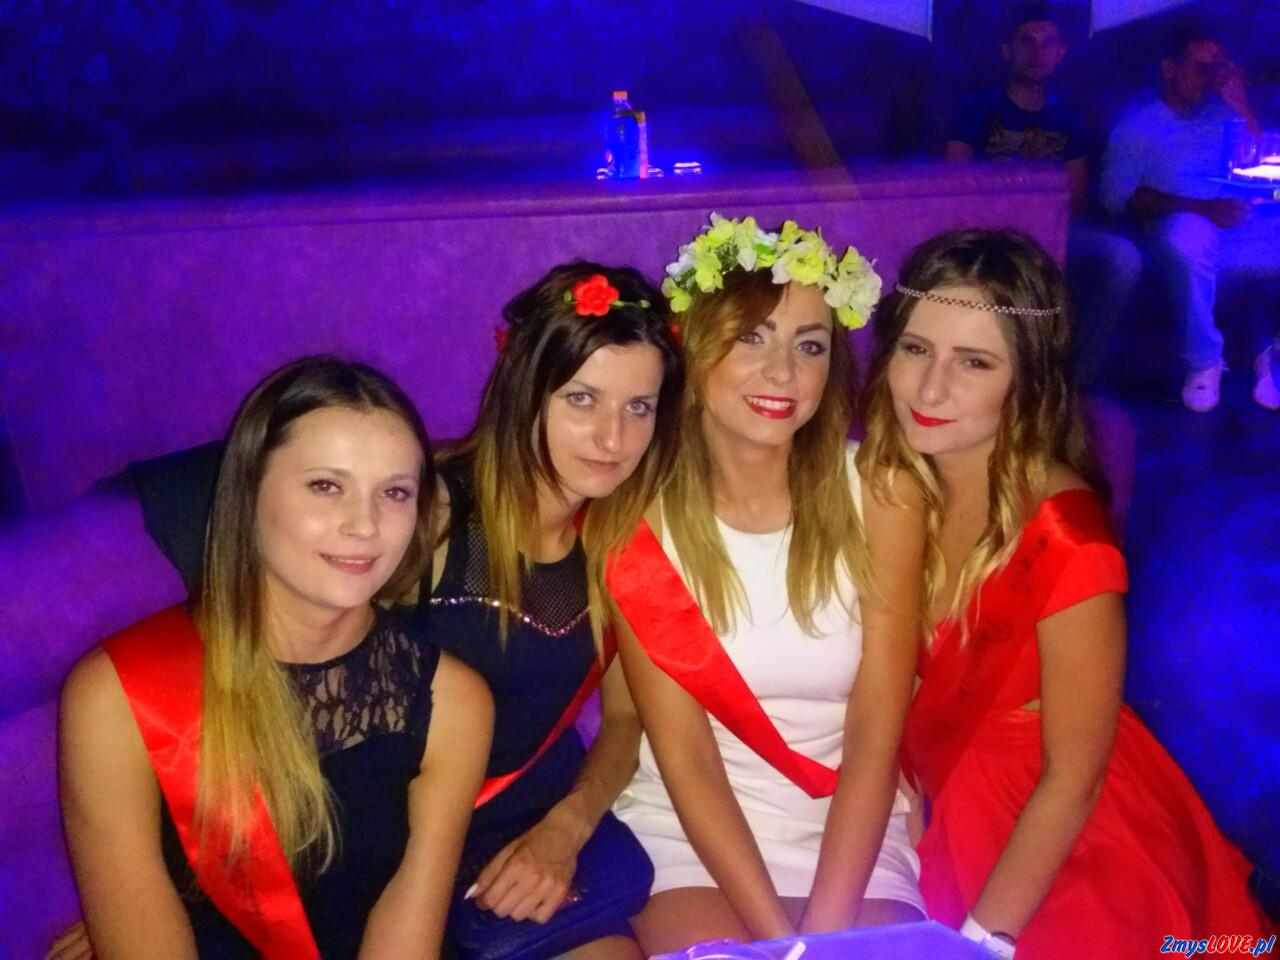 Ania, Iwona, Małgosia i Ksenia